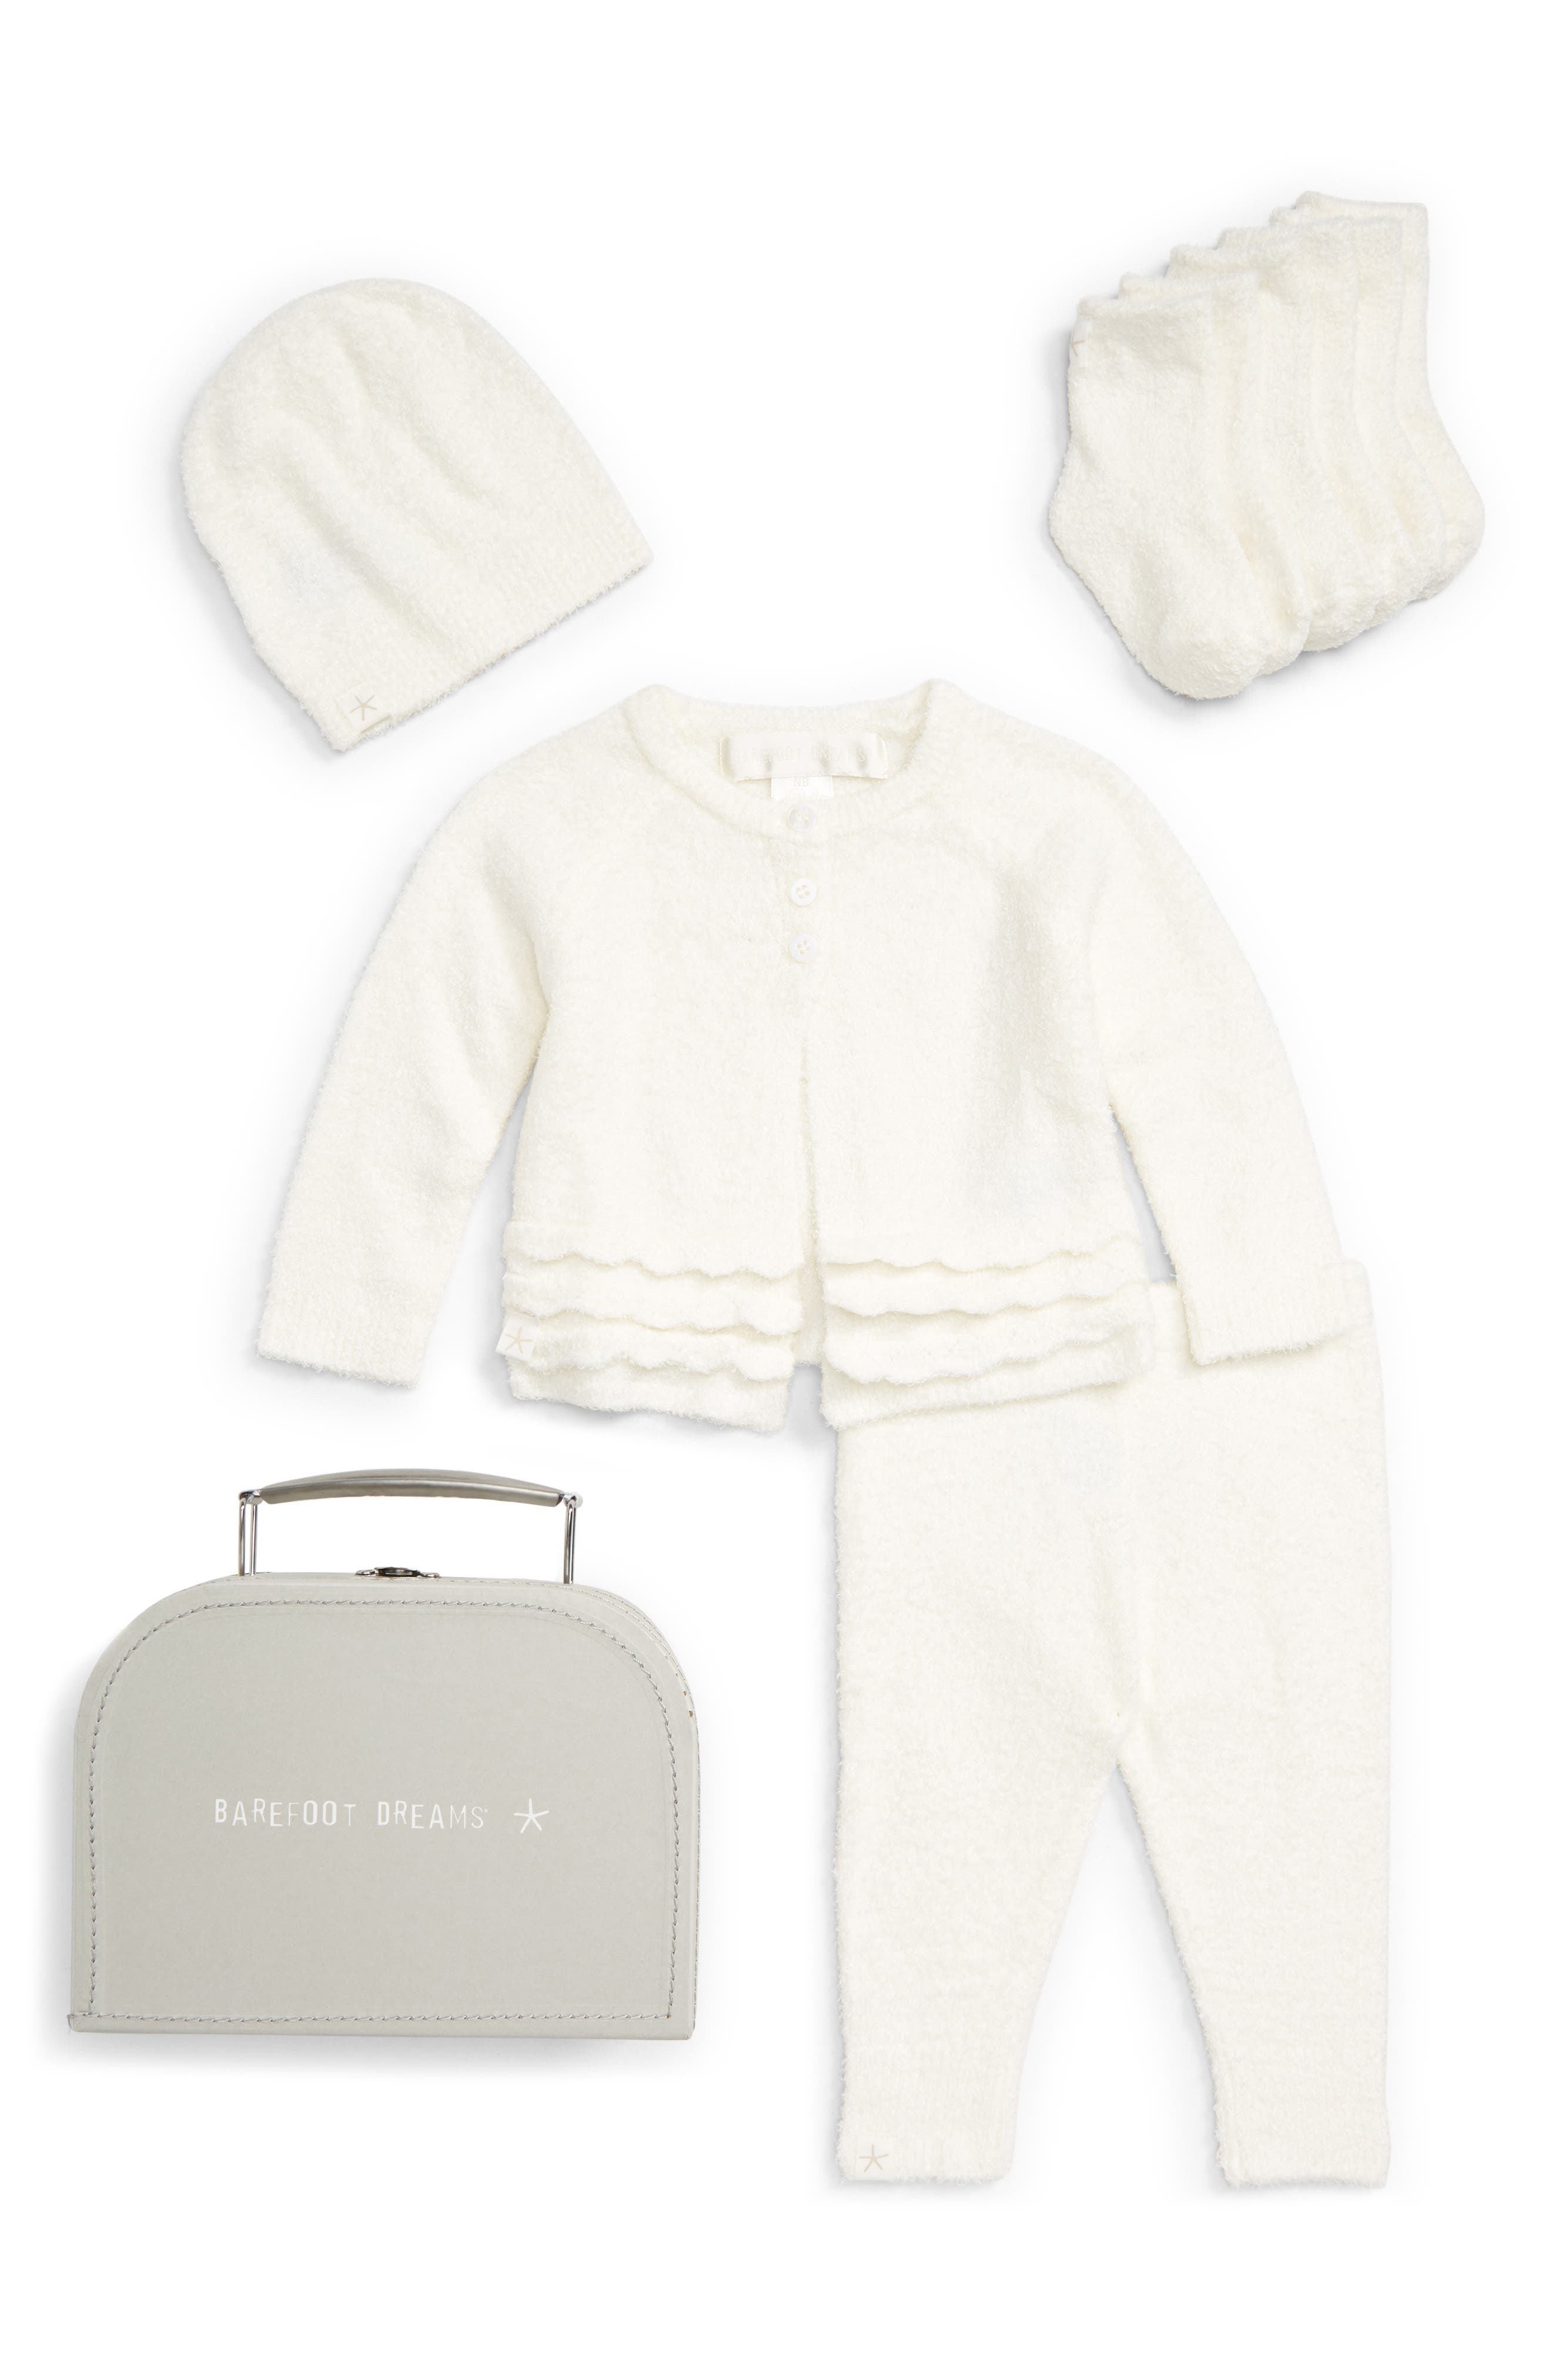 CozyChic<sup>®</sup> Lite Heirloom Cardigan, Pants, Socks, Beanie & Suitcase Set,                         Main,                         color, PEARL